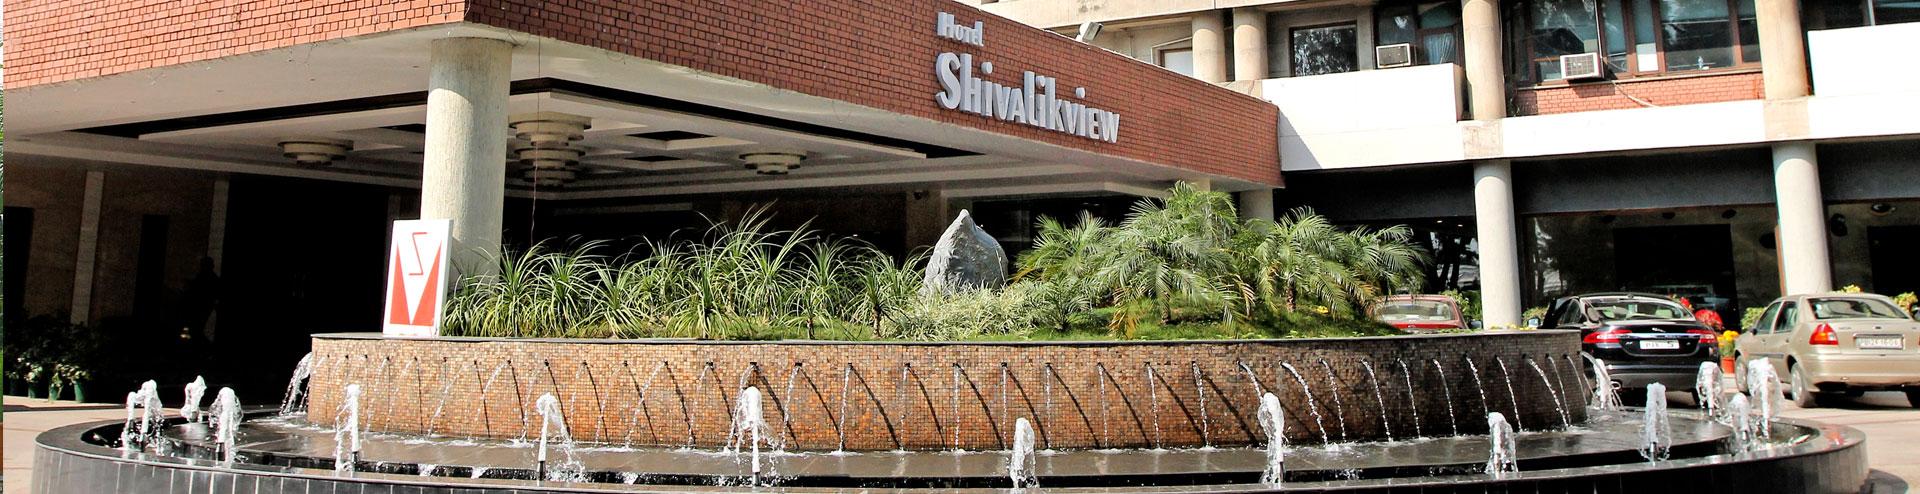 shivalikview-hotel-slider-2